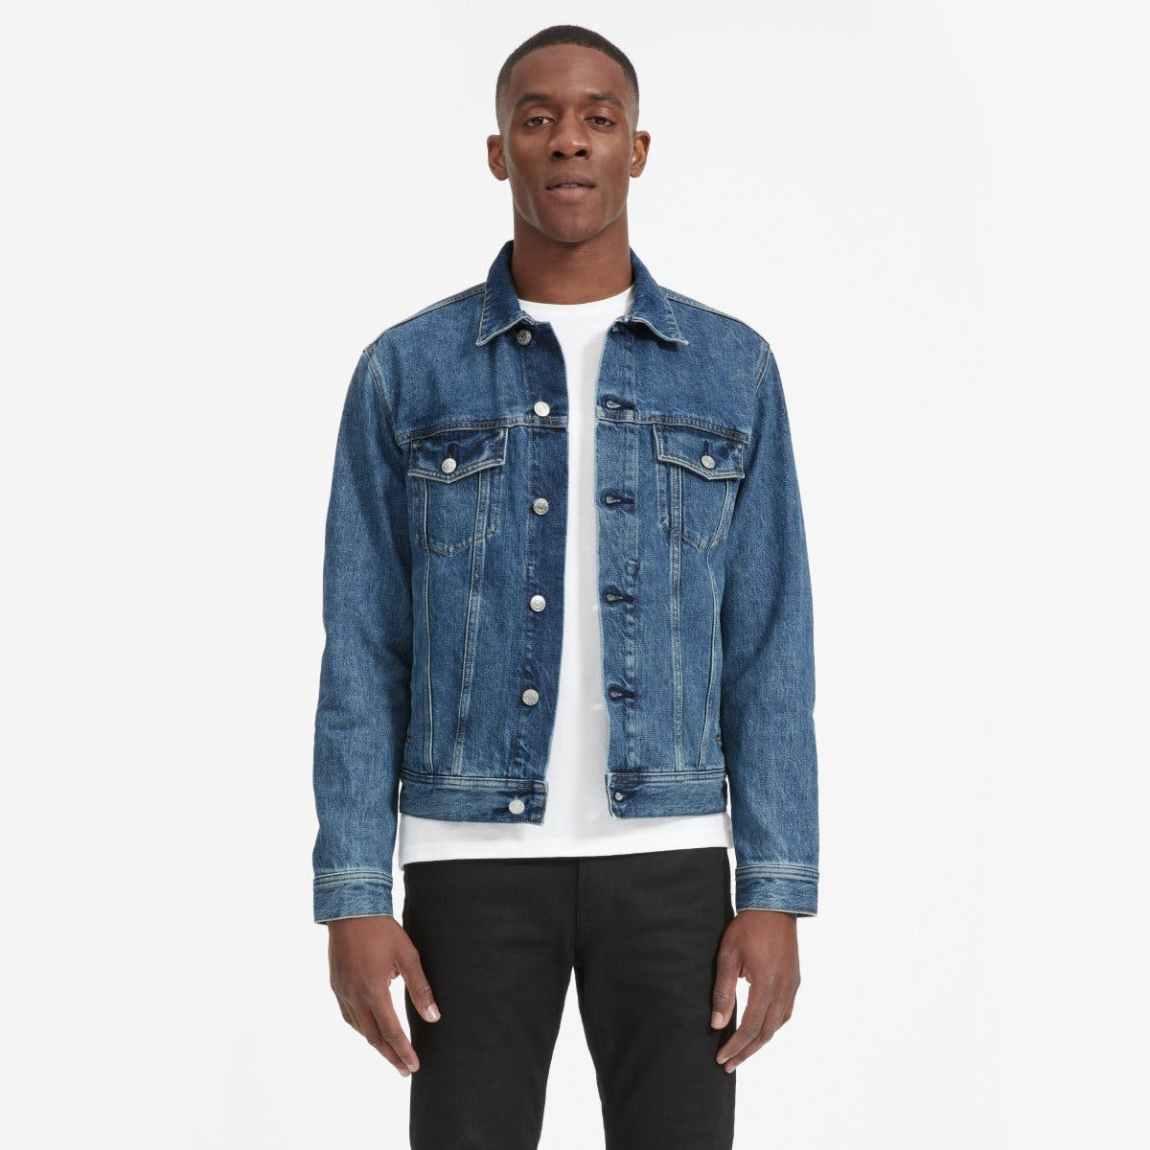 everlane, everlane jeans, everlane denim, japanese denim, denim jacket, jean jacket, trucker jacket, denimblog, denim blog